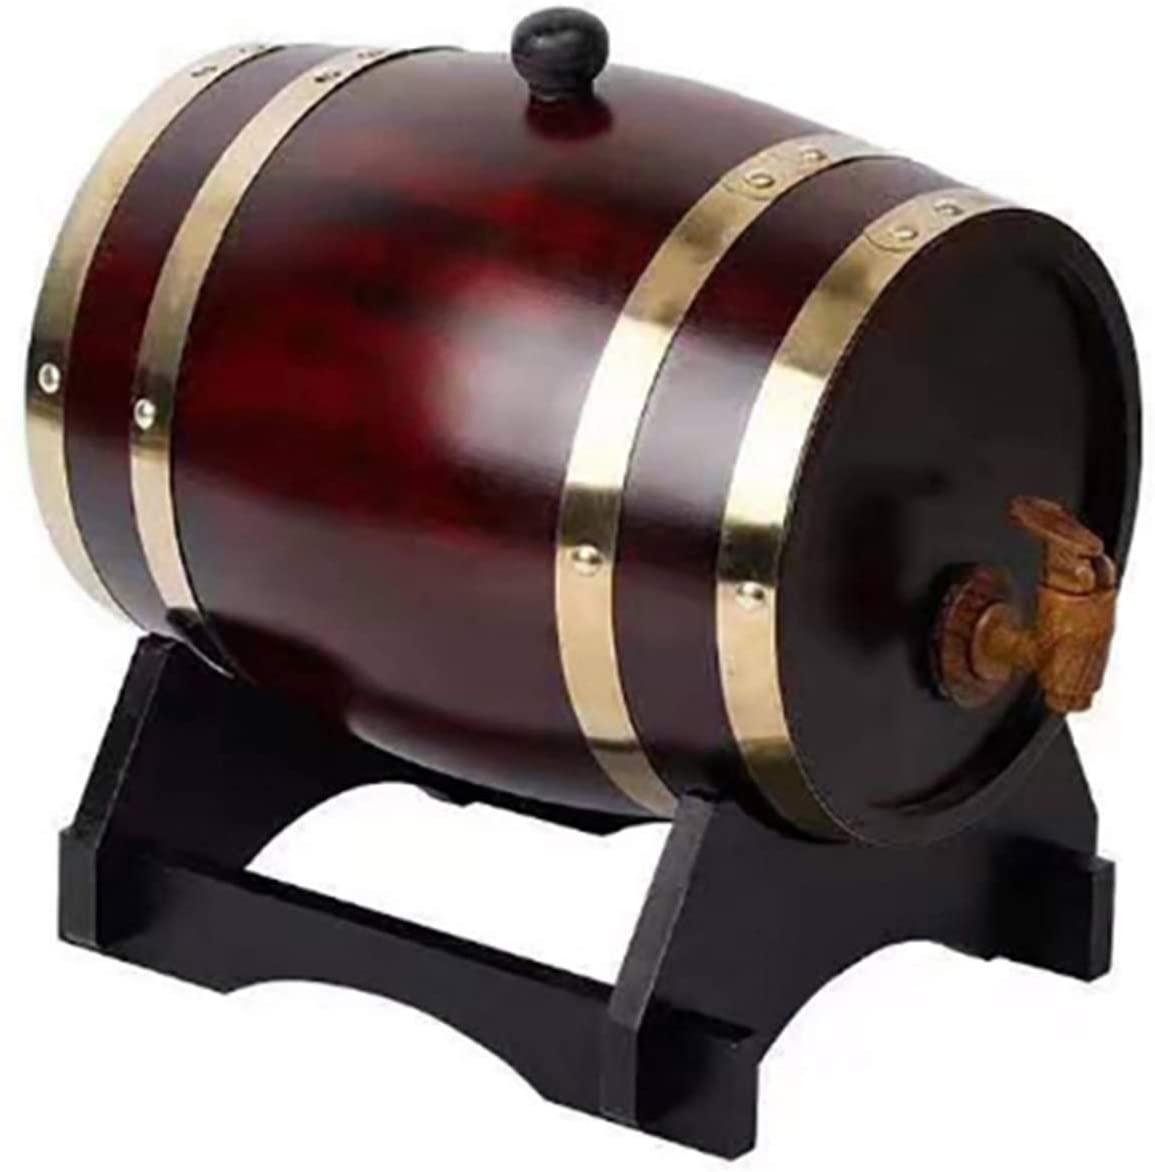 LI&muzi 1.5L Wood Barrel Vintage Beer Brewing Tools Tap Dispenser, for Whisky Wine Mini Keg Bar Home Brew Beer Keg,Color 1